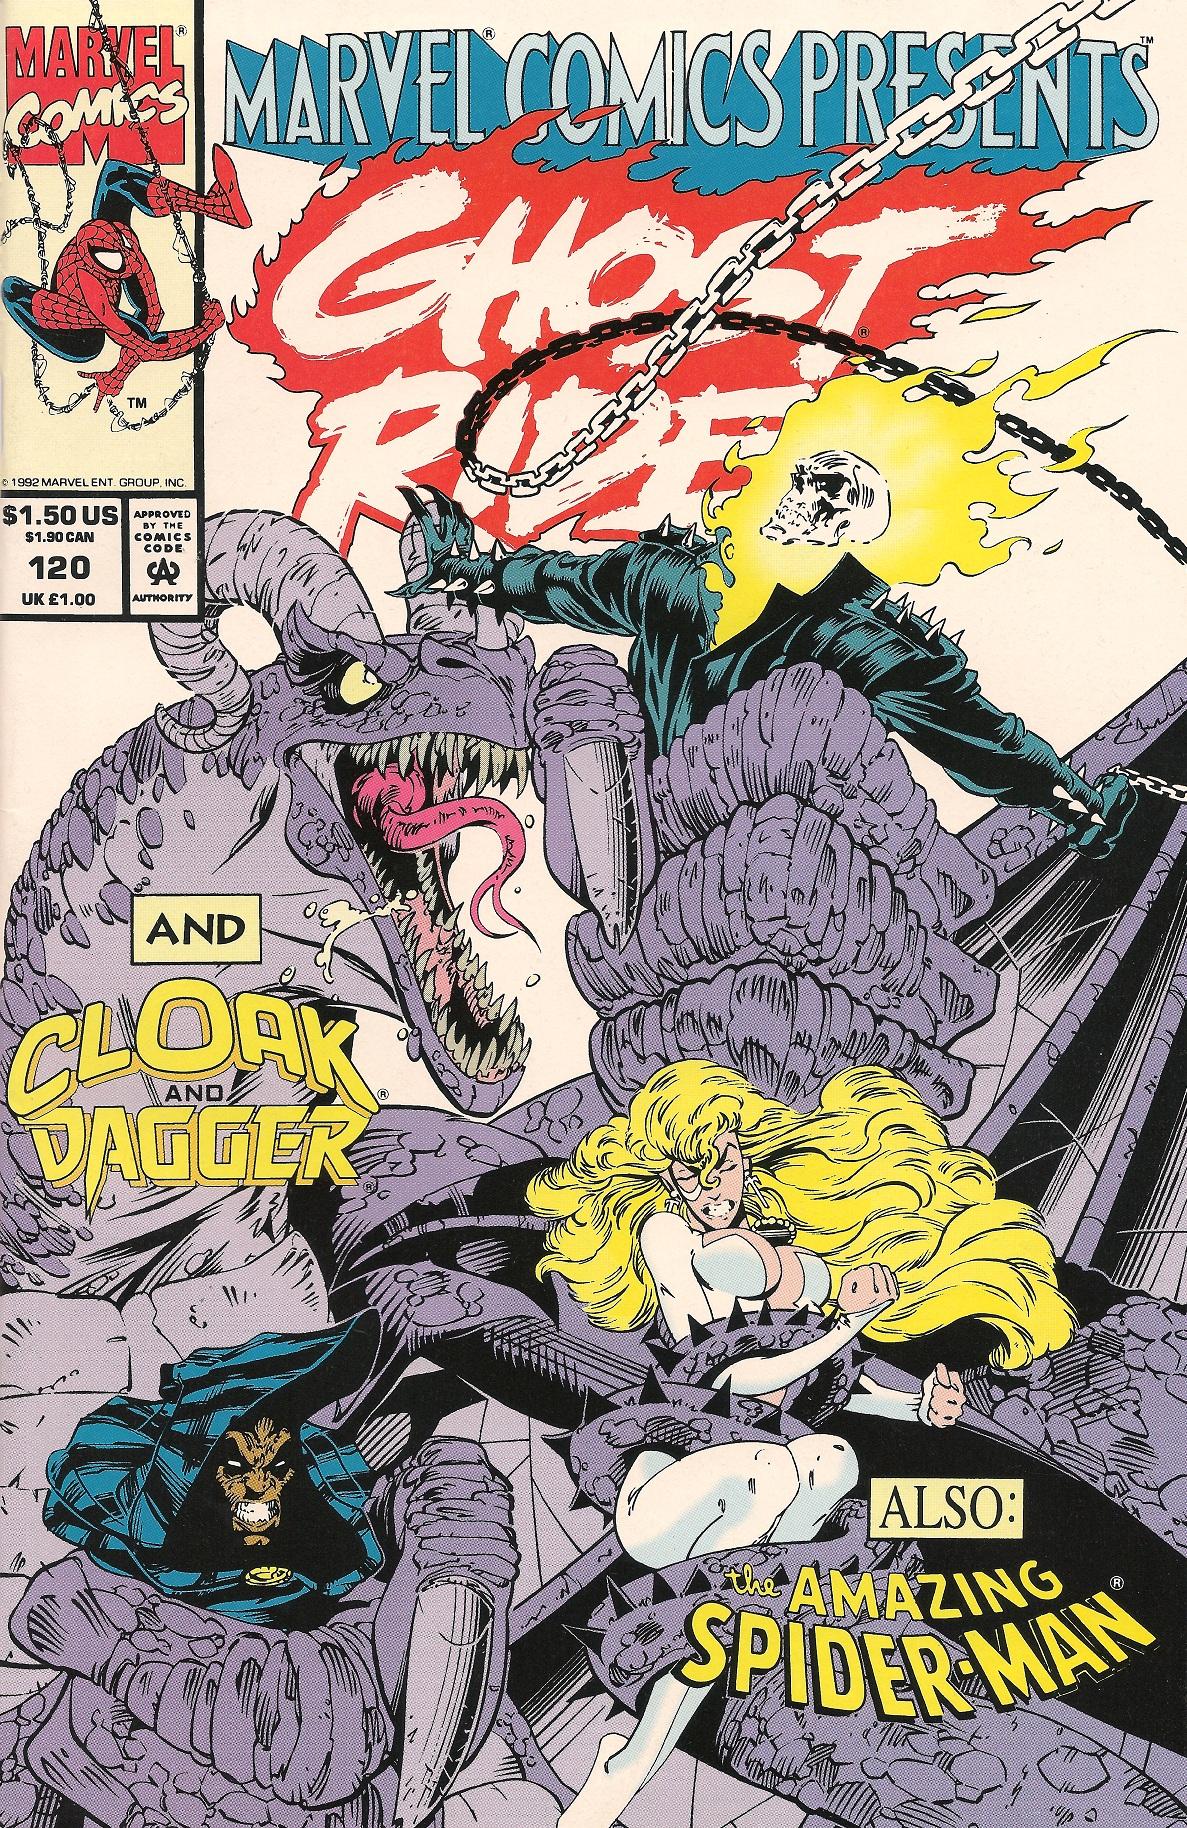 Marvel comics presents vol 1 120 marvel database fandom powered by wikia - Marvel spiderman comics pdf ...